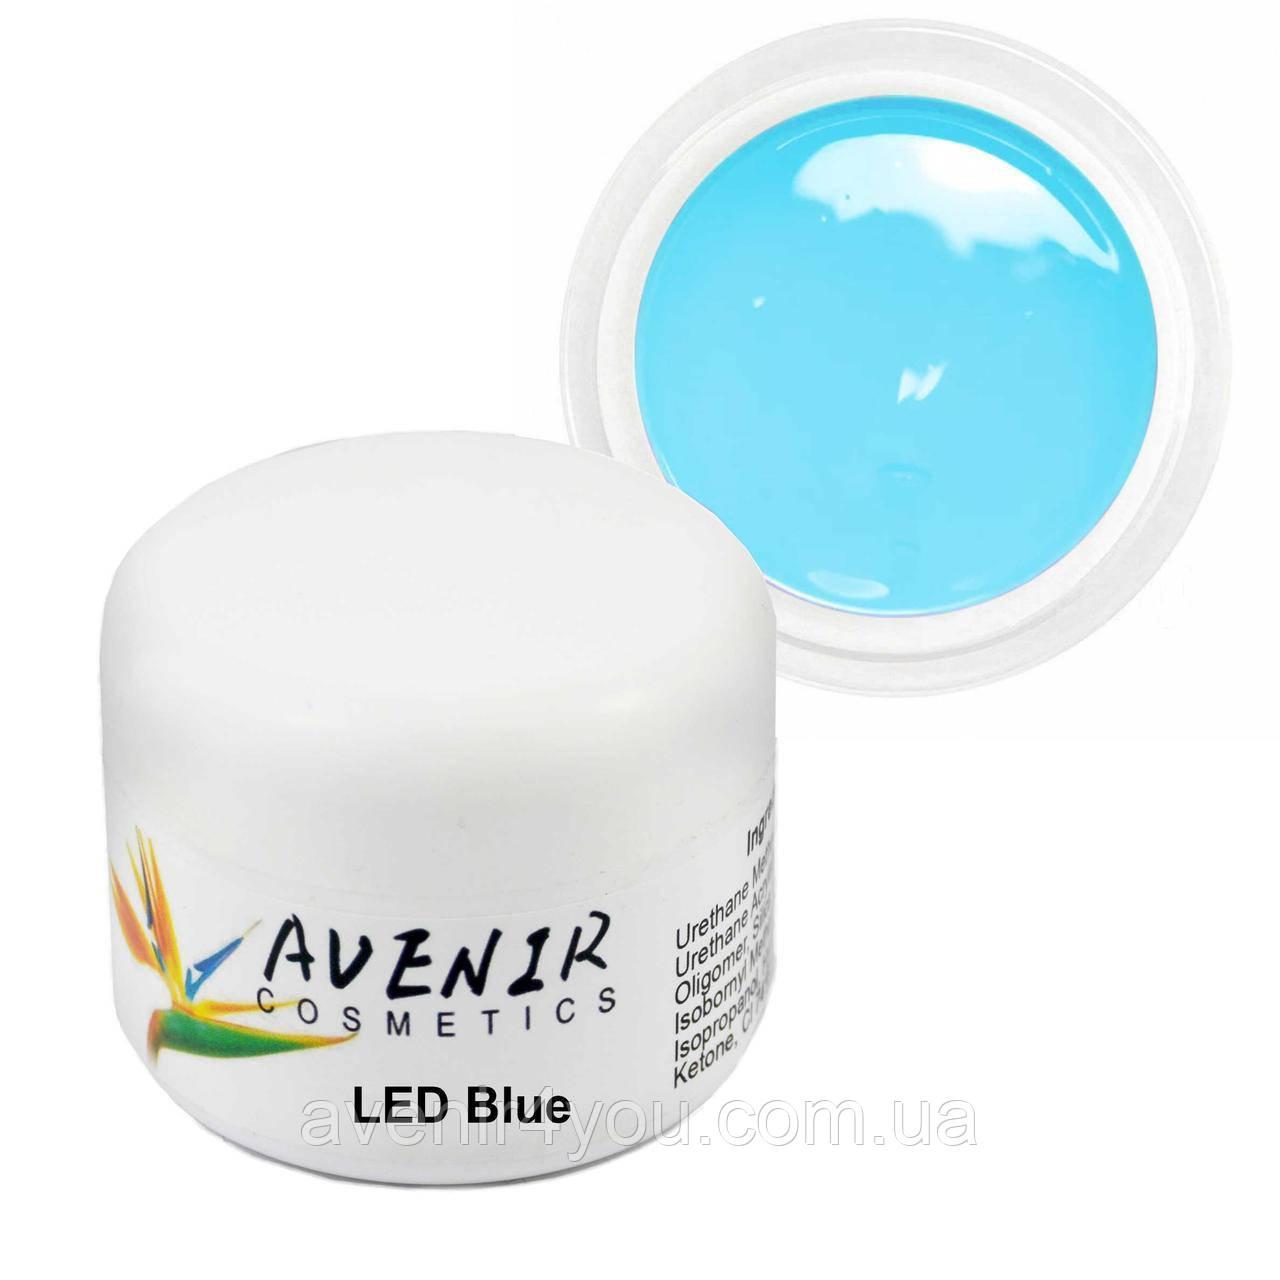 Гель для наращивания LED Blue Avenir 30 мл